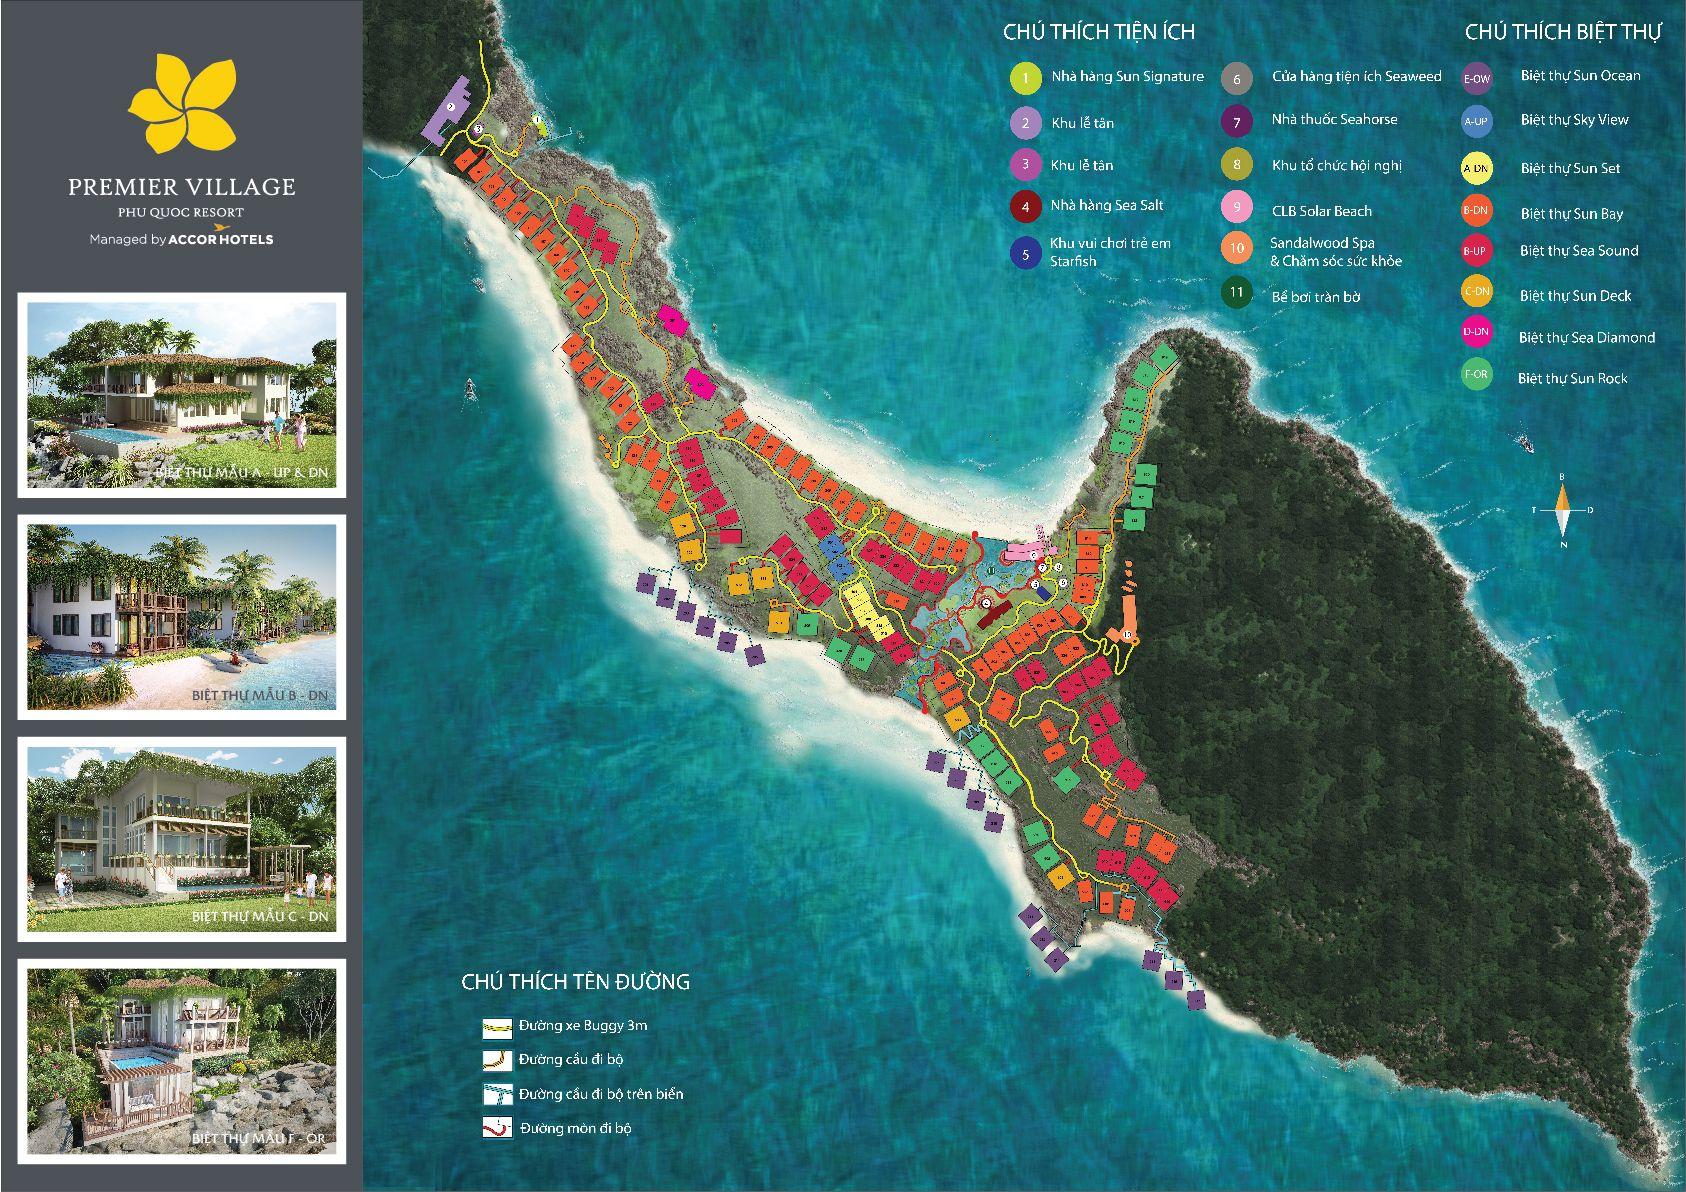 Premier Village Phu Quoc Resort Site plan, Phu quoc, Village